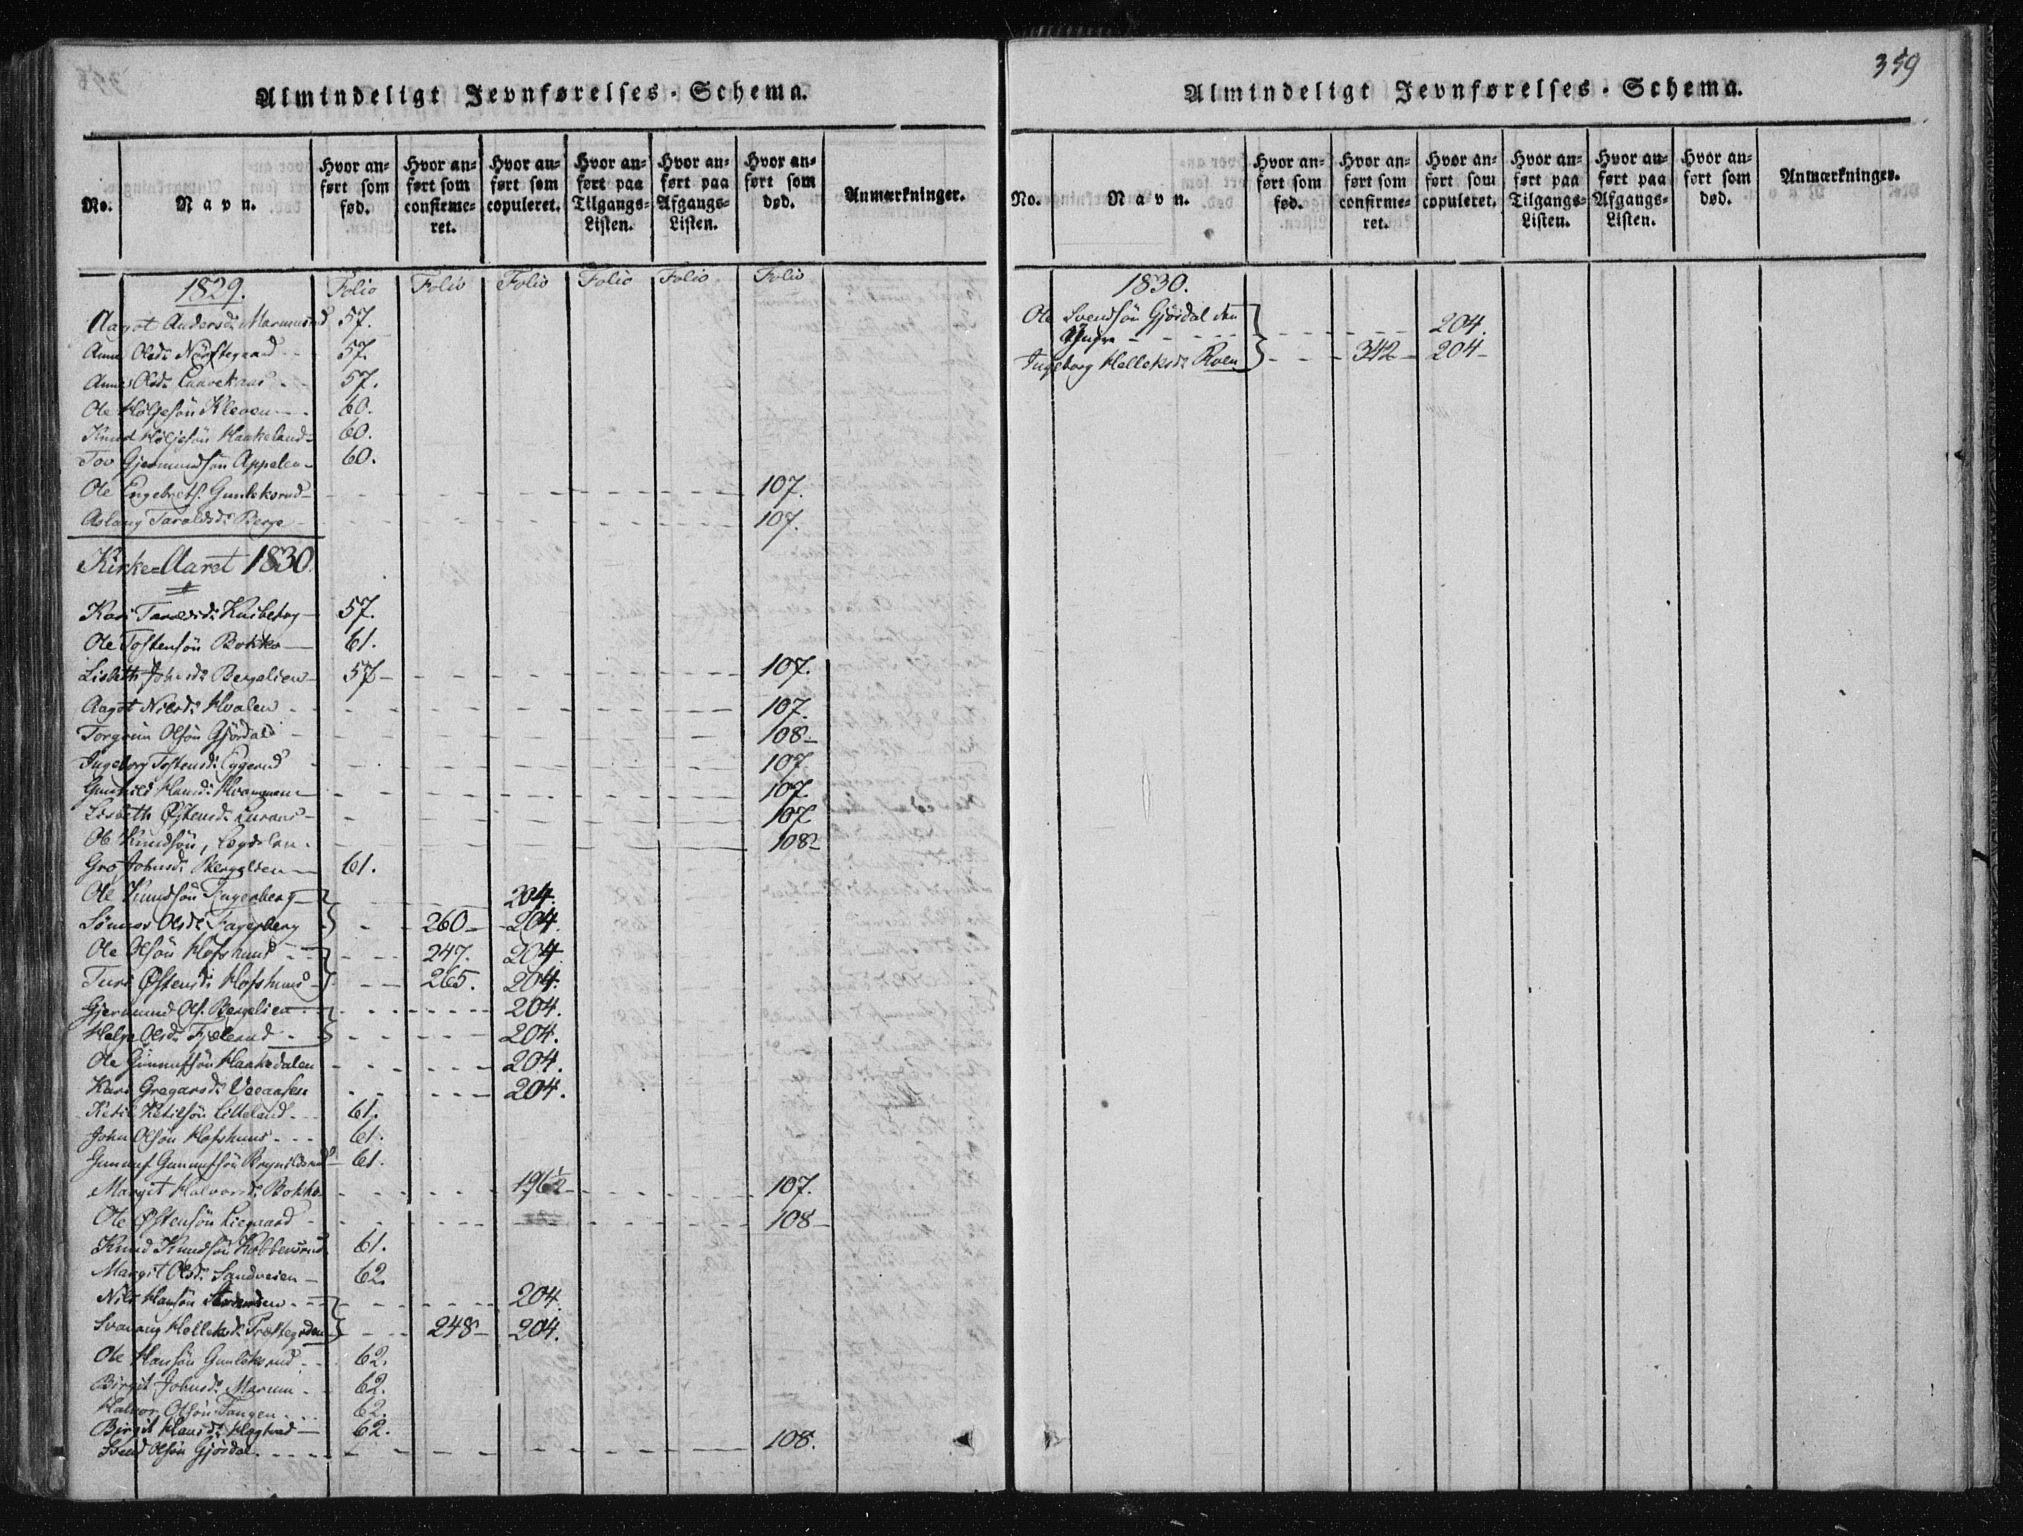 SAKO, Tinn kirkebøker, F/Fa/L0004: Ministerialbok nr. I 4, 1815-1843, s. 359